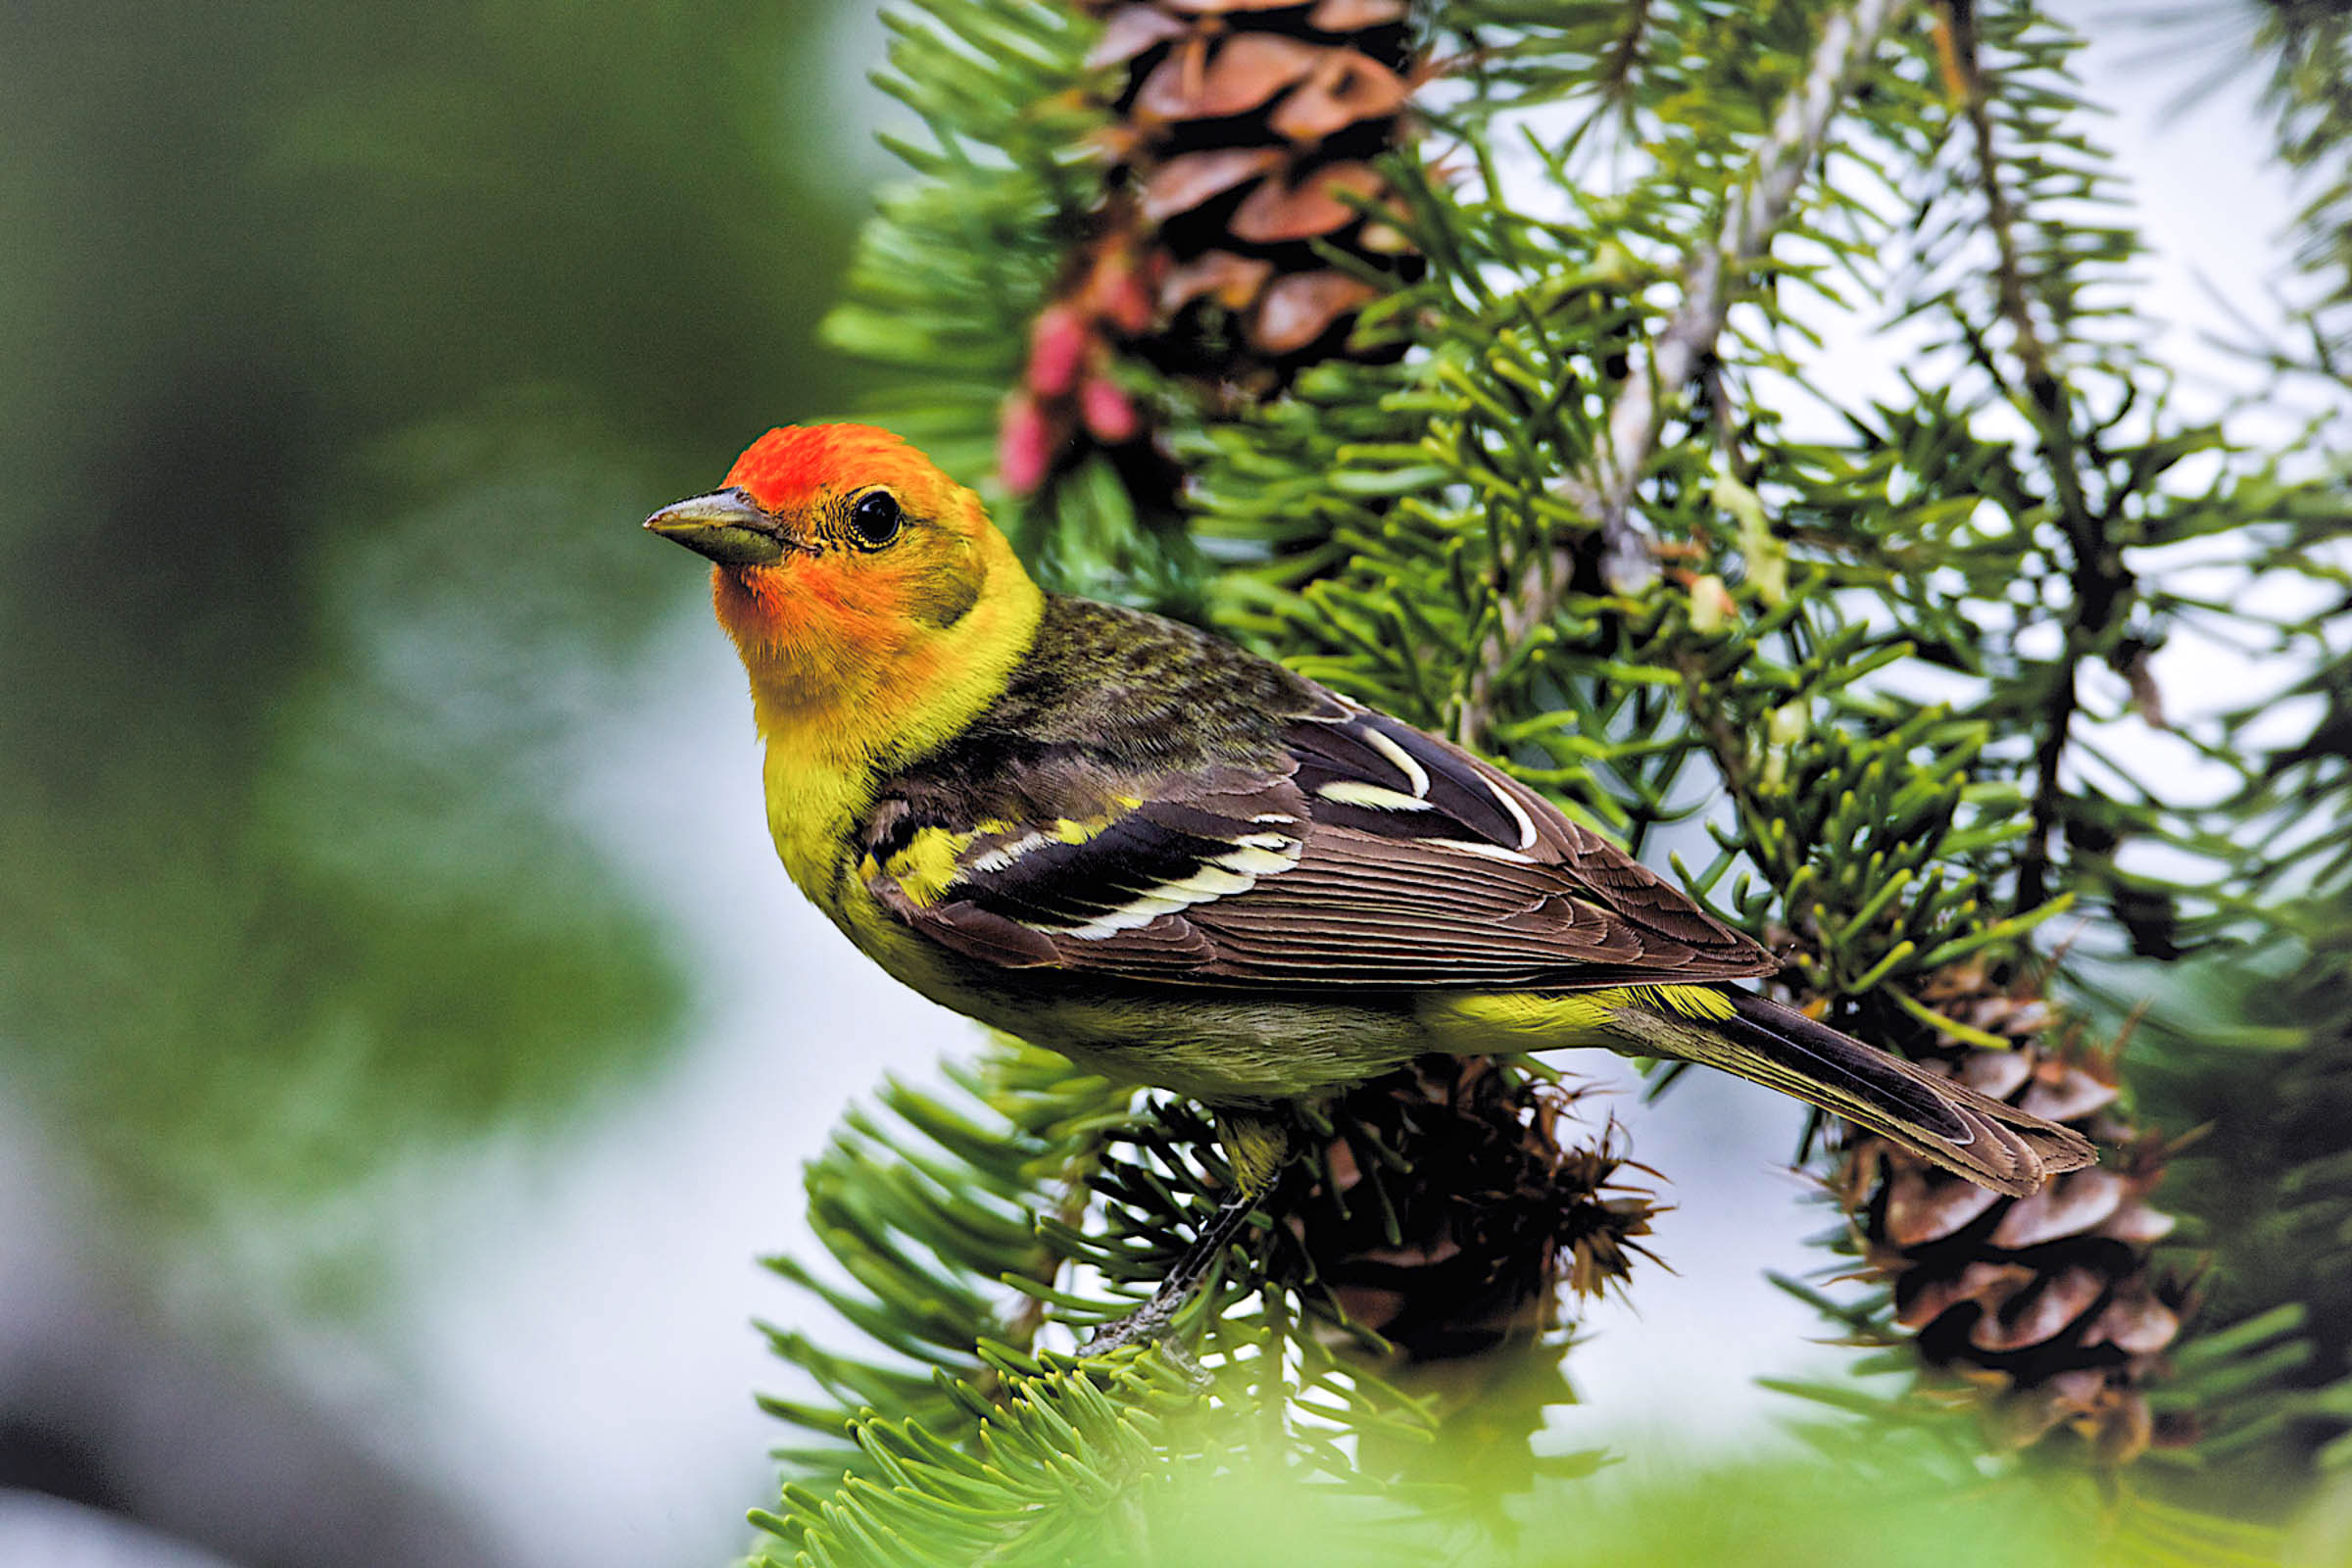 Western Tanager in Douglas fir. Timothy Lenahan/Audubon Photography Awards